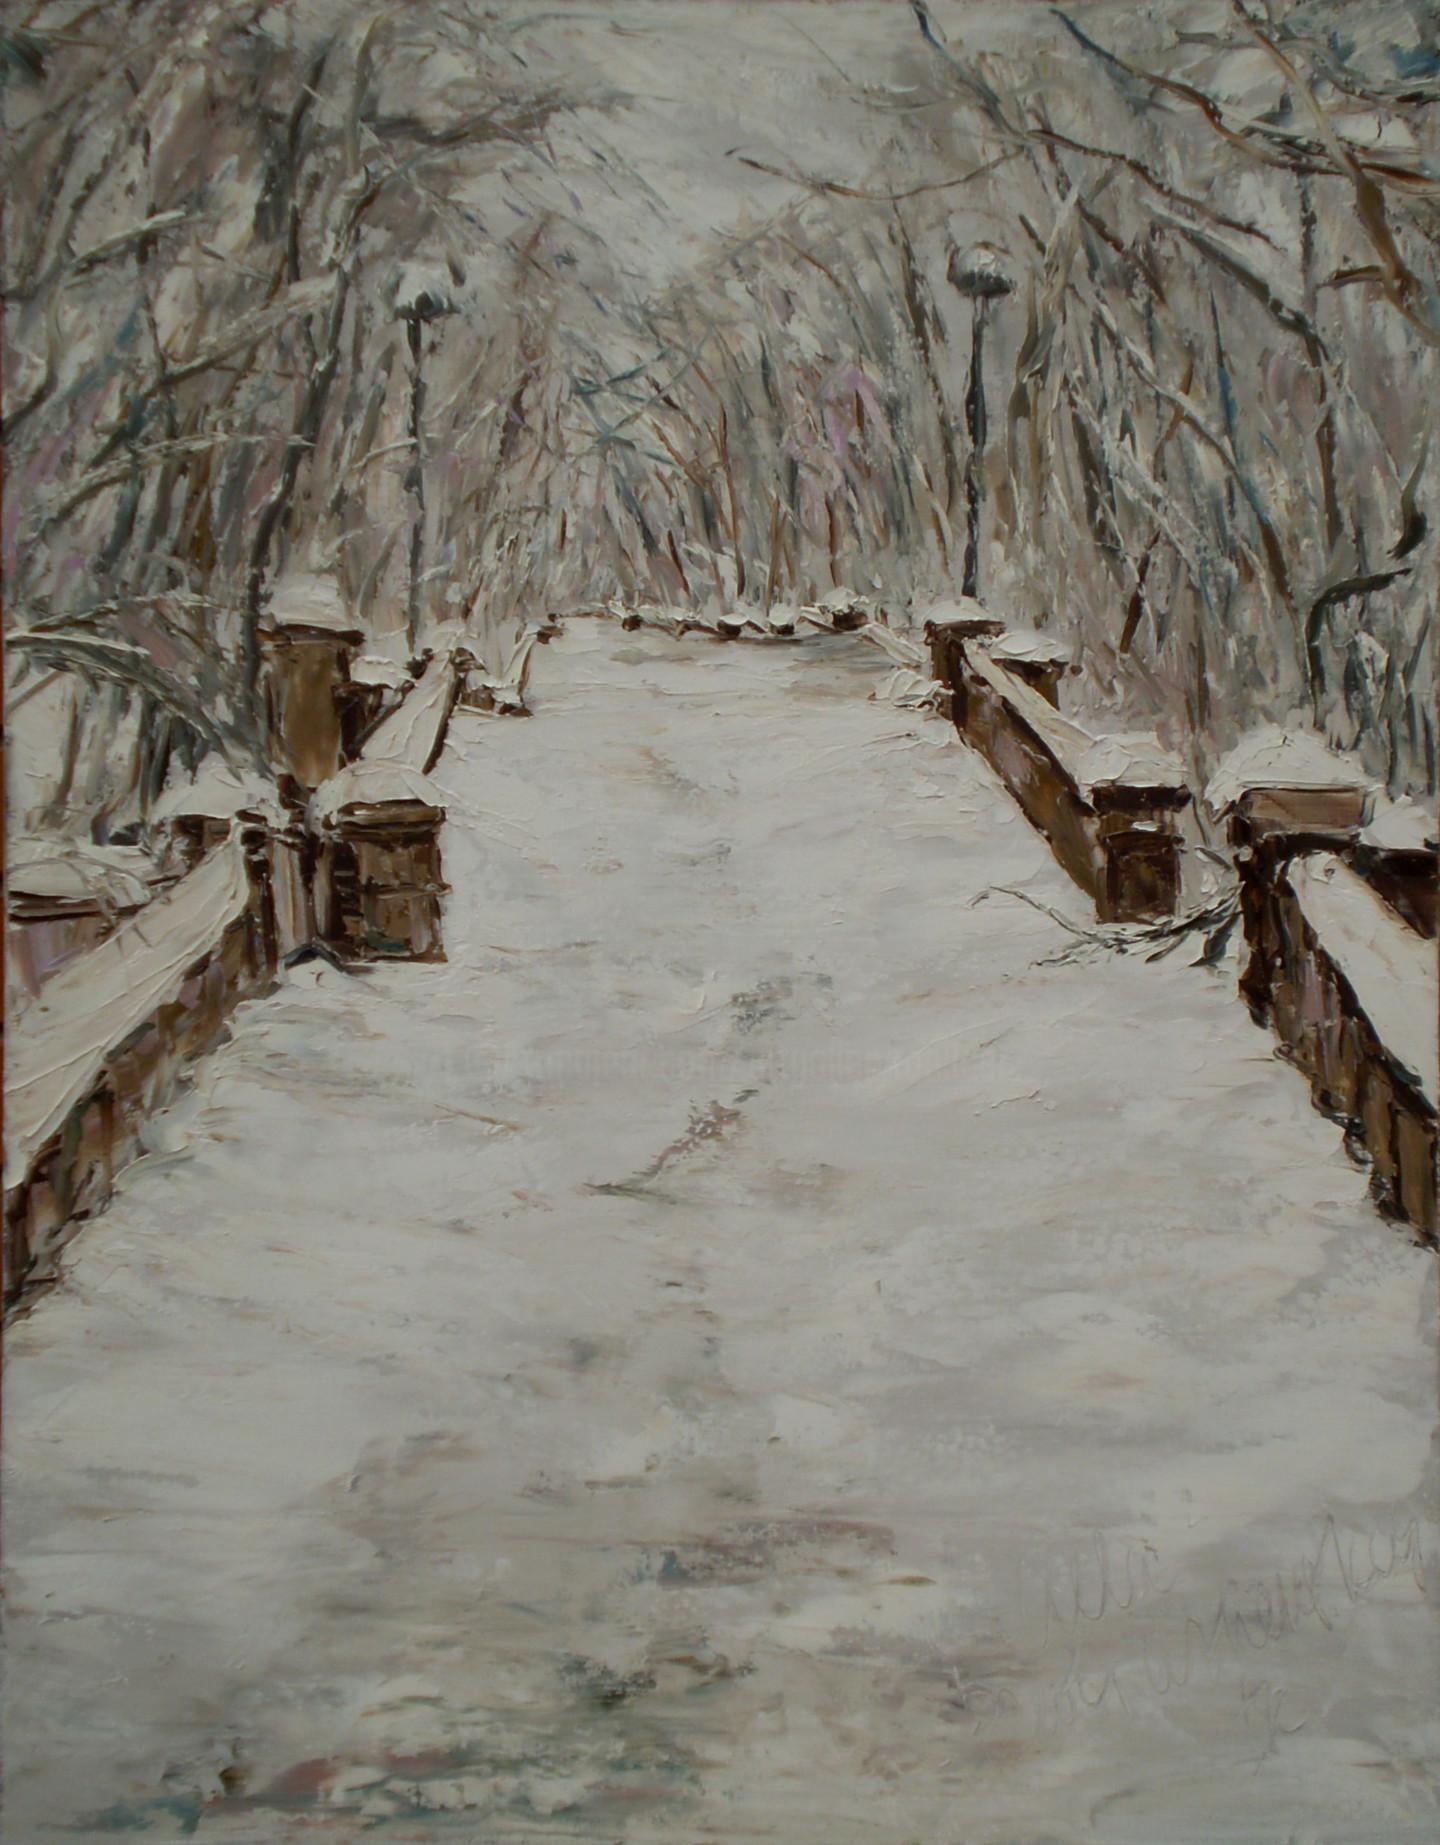 Alla Preobrazhenska-Ronikier - Winter lane